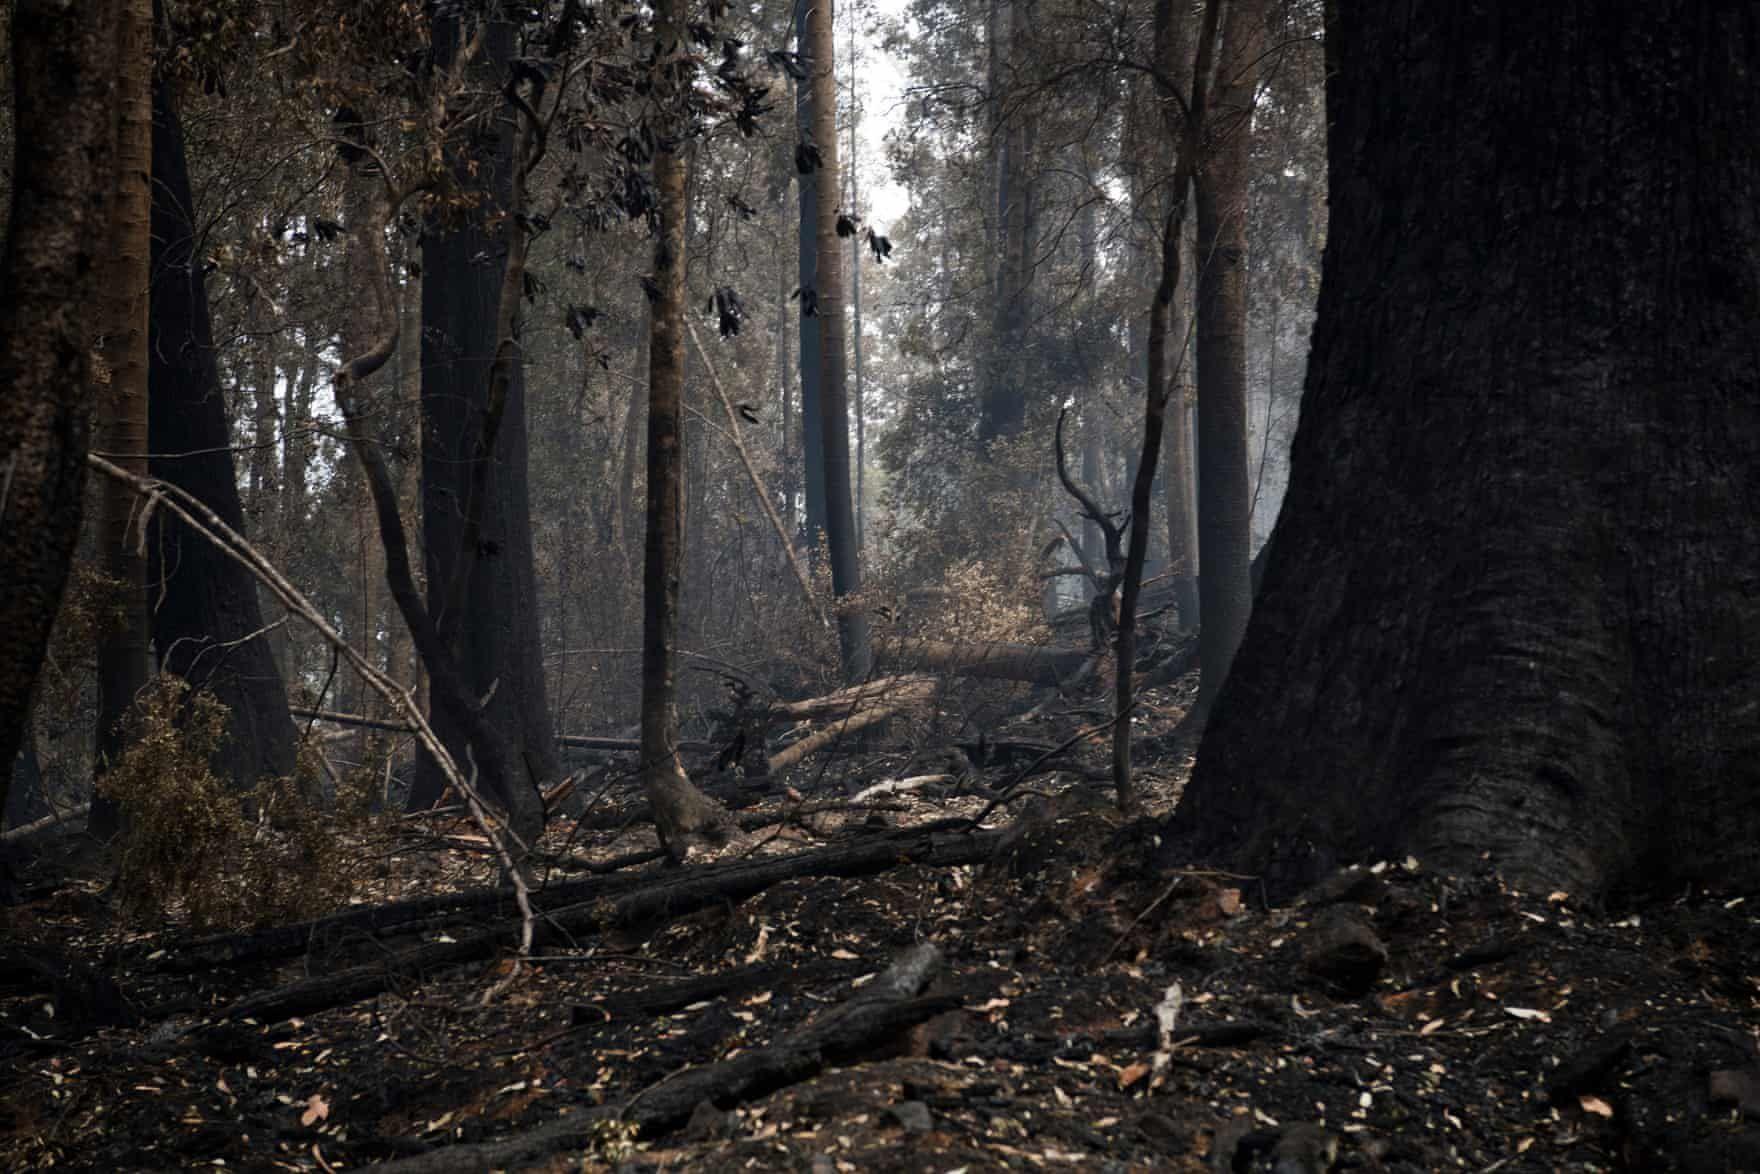 The destructive Tasmanian bushfires 2019 in pictures